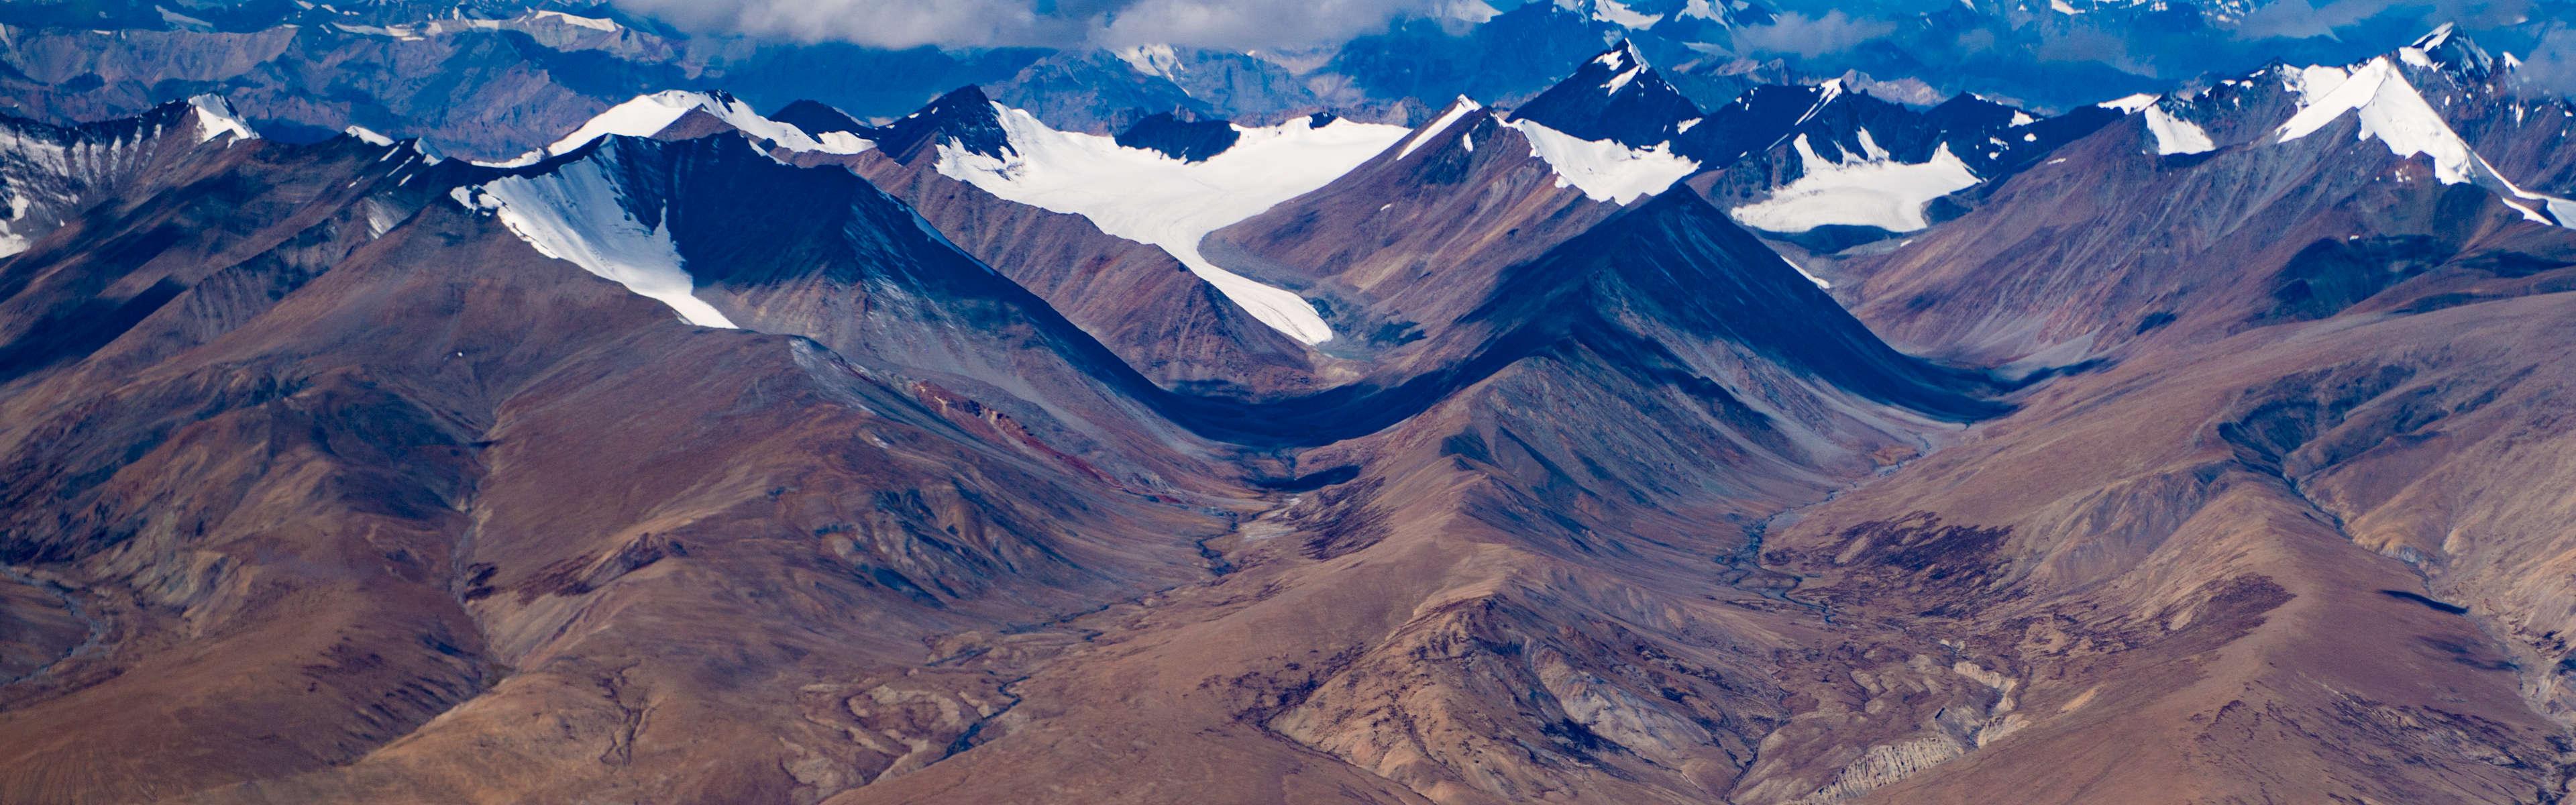 20160913-Ladakh-Autumn16-1585